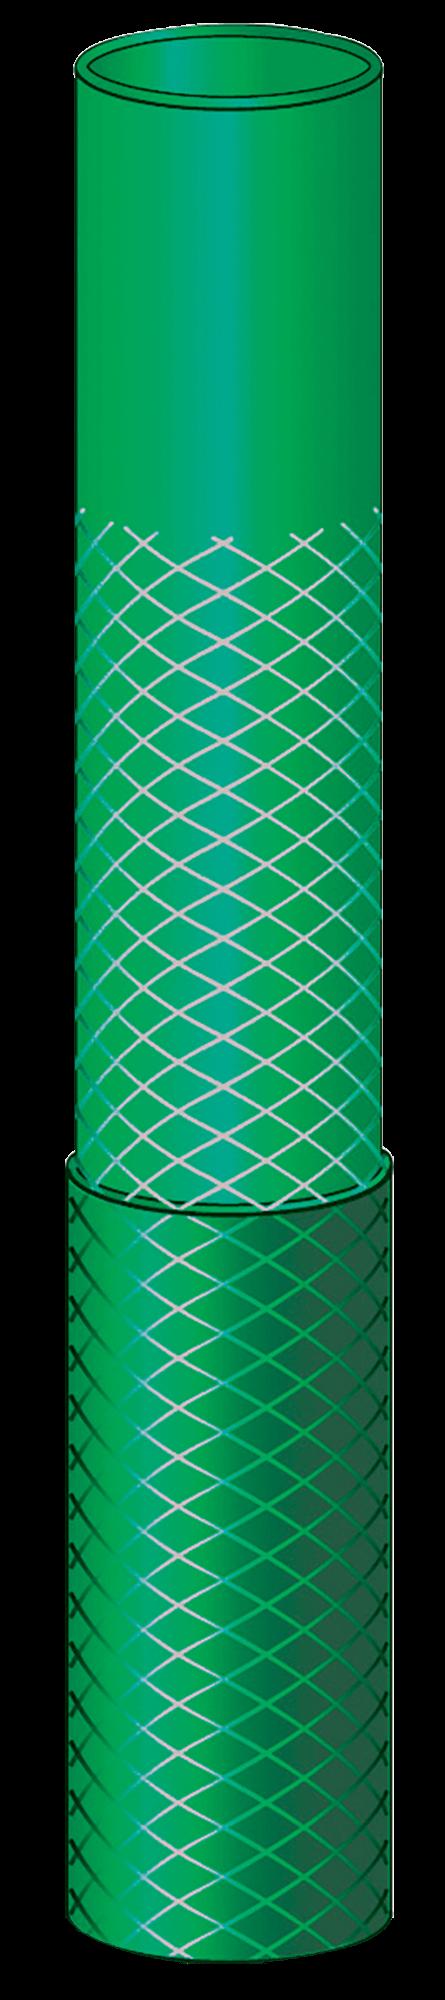 Mangueira Flex Pvc 20m Para Casa Engate Rosqueado Tramontina